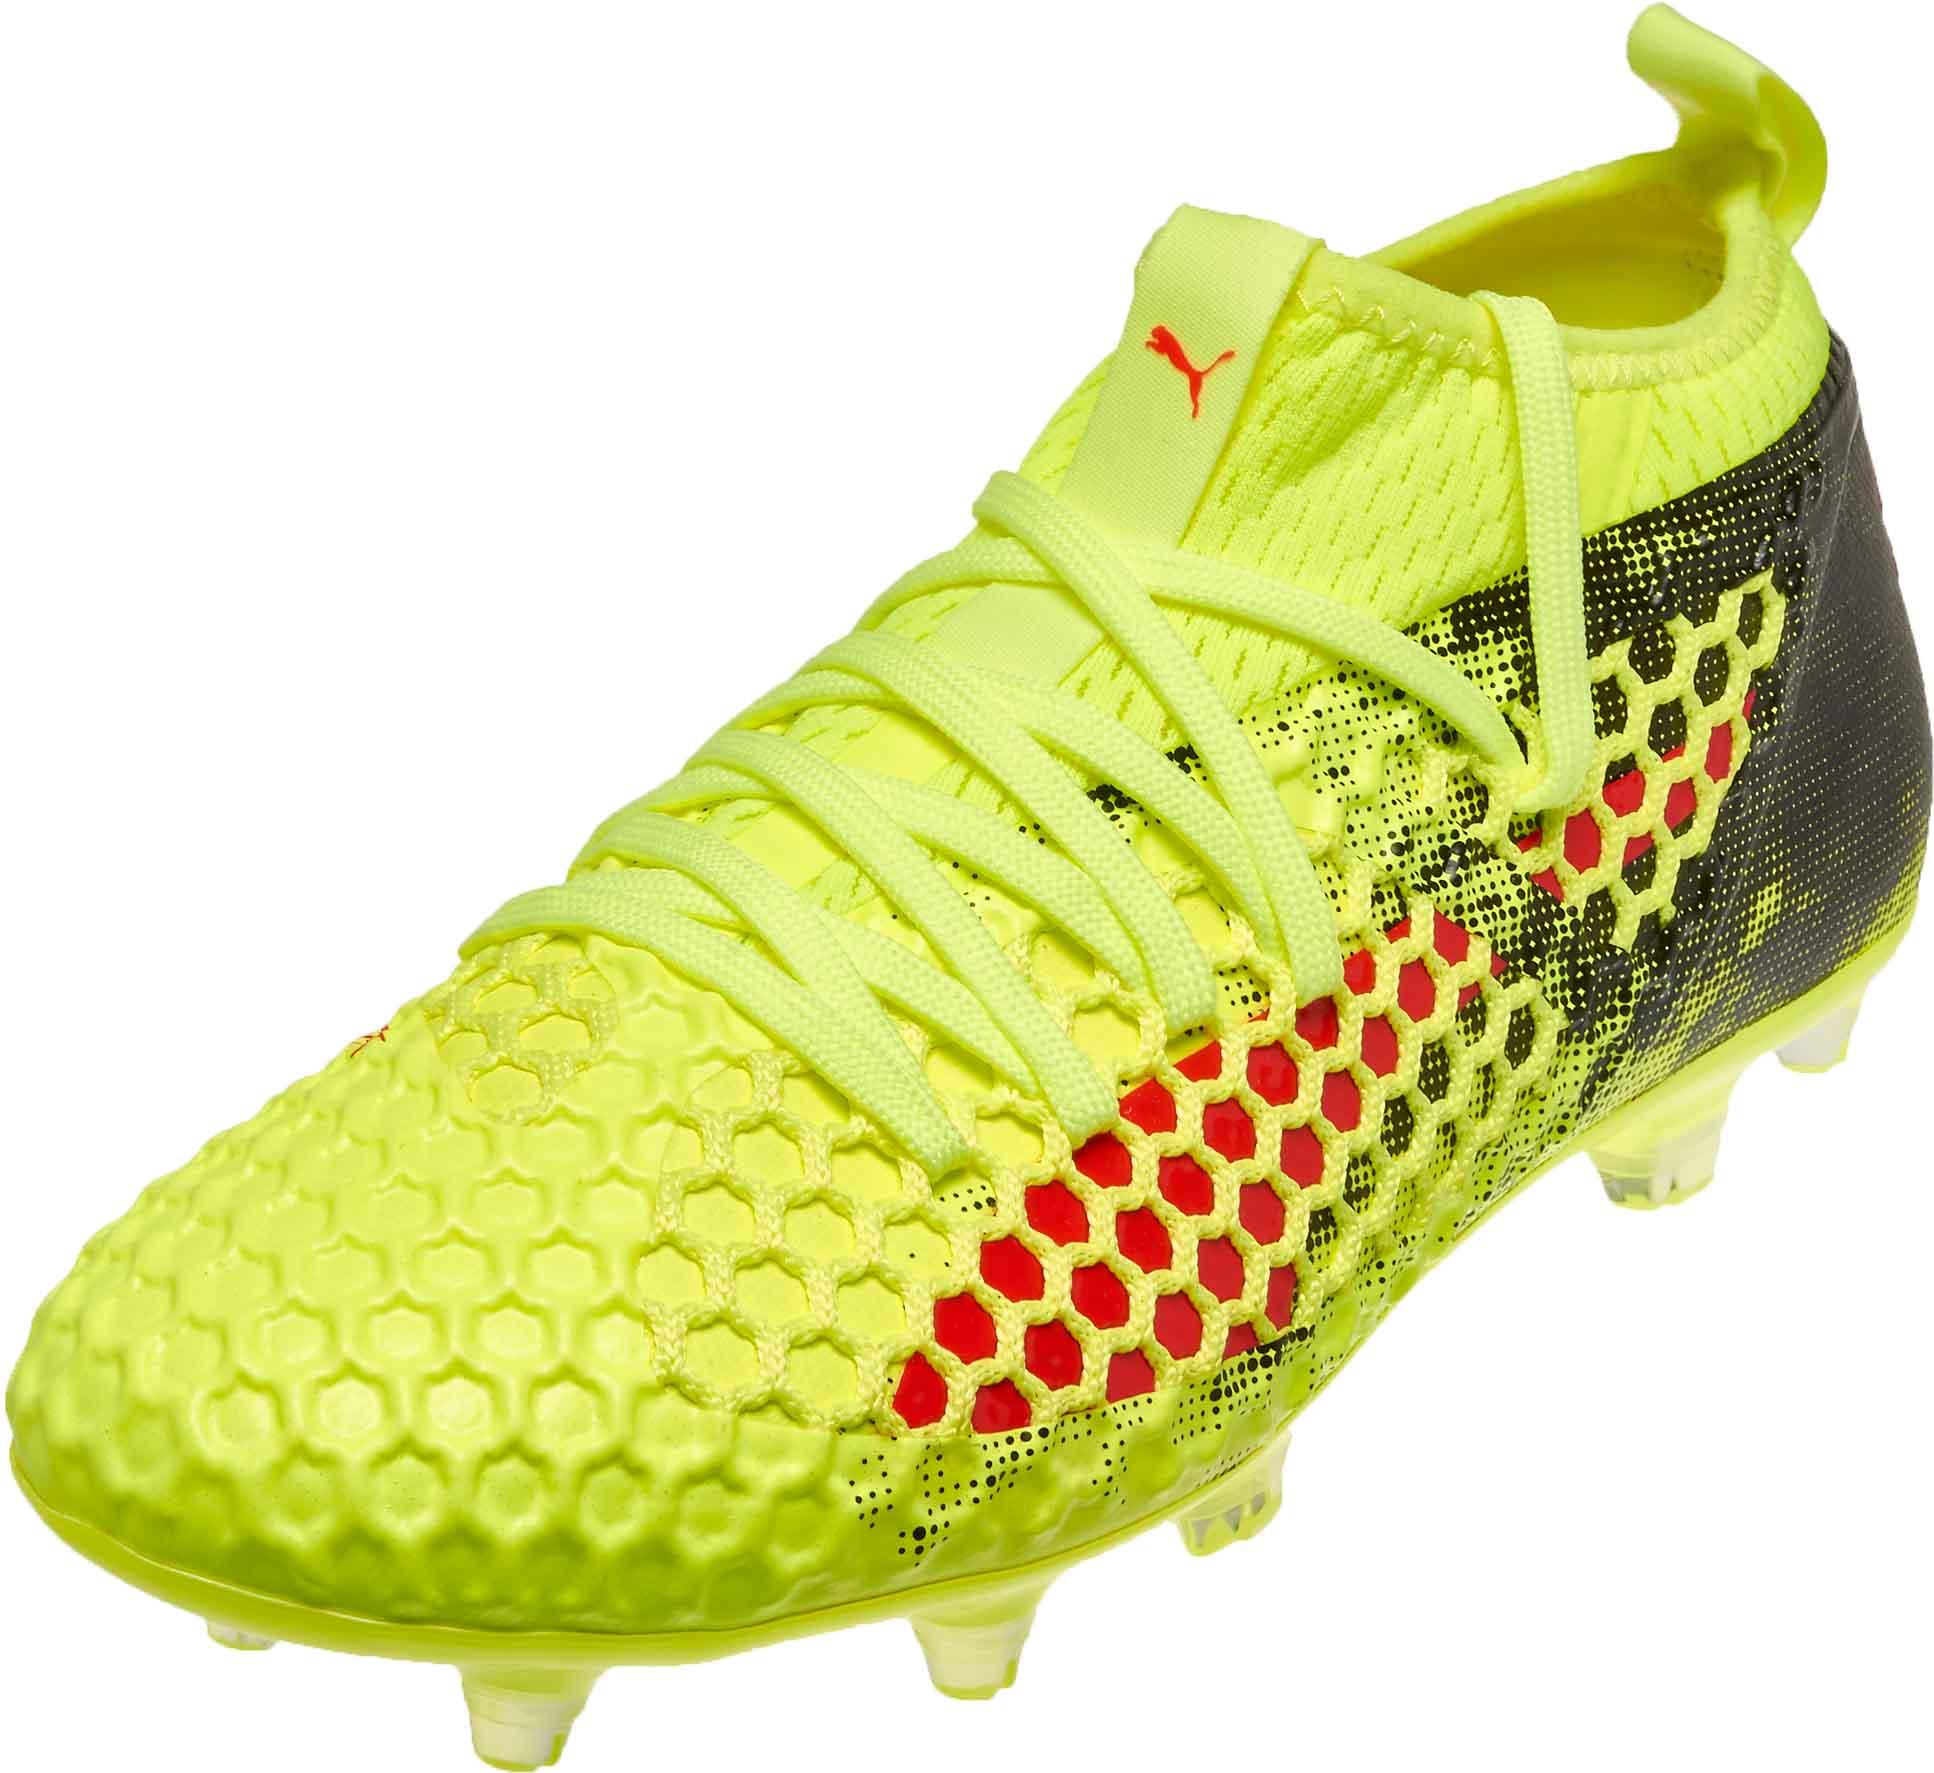 c29d1ba9656 Puma Future 18.2 Netfit FG - Fizzy Yellow   Red Blast - Soccer Master